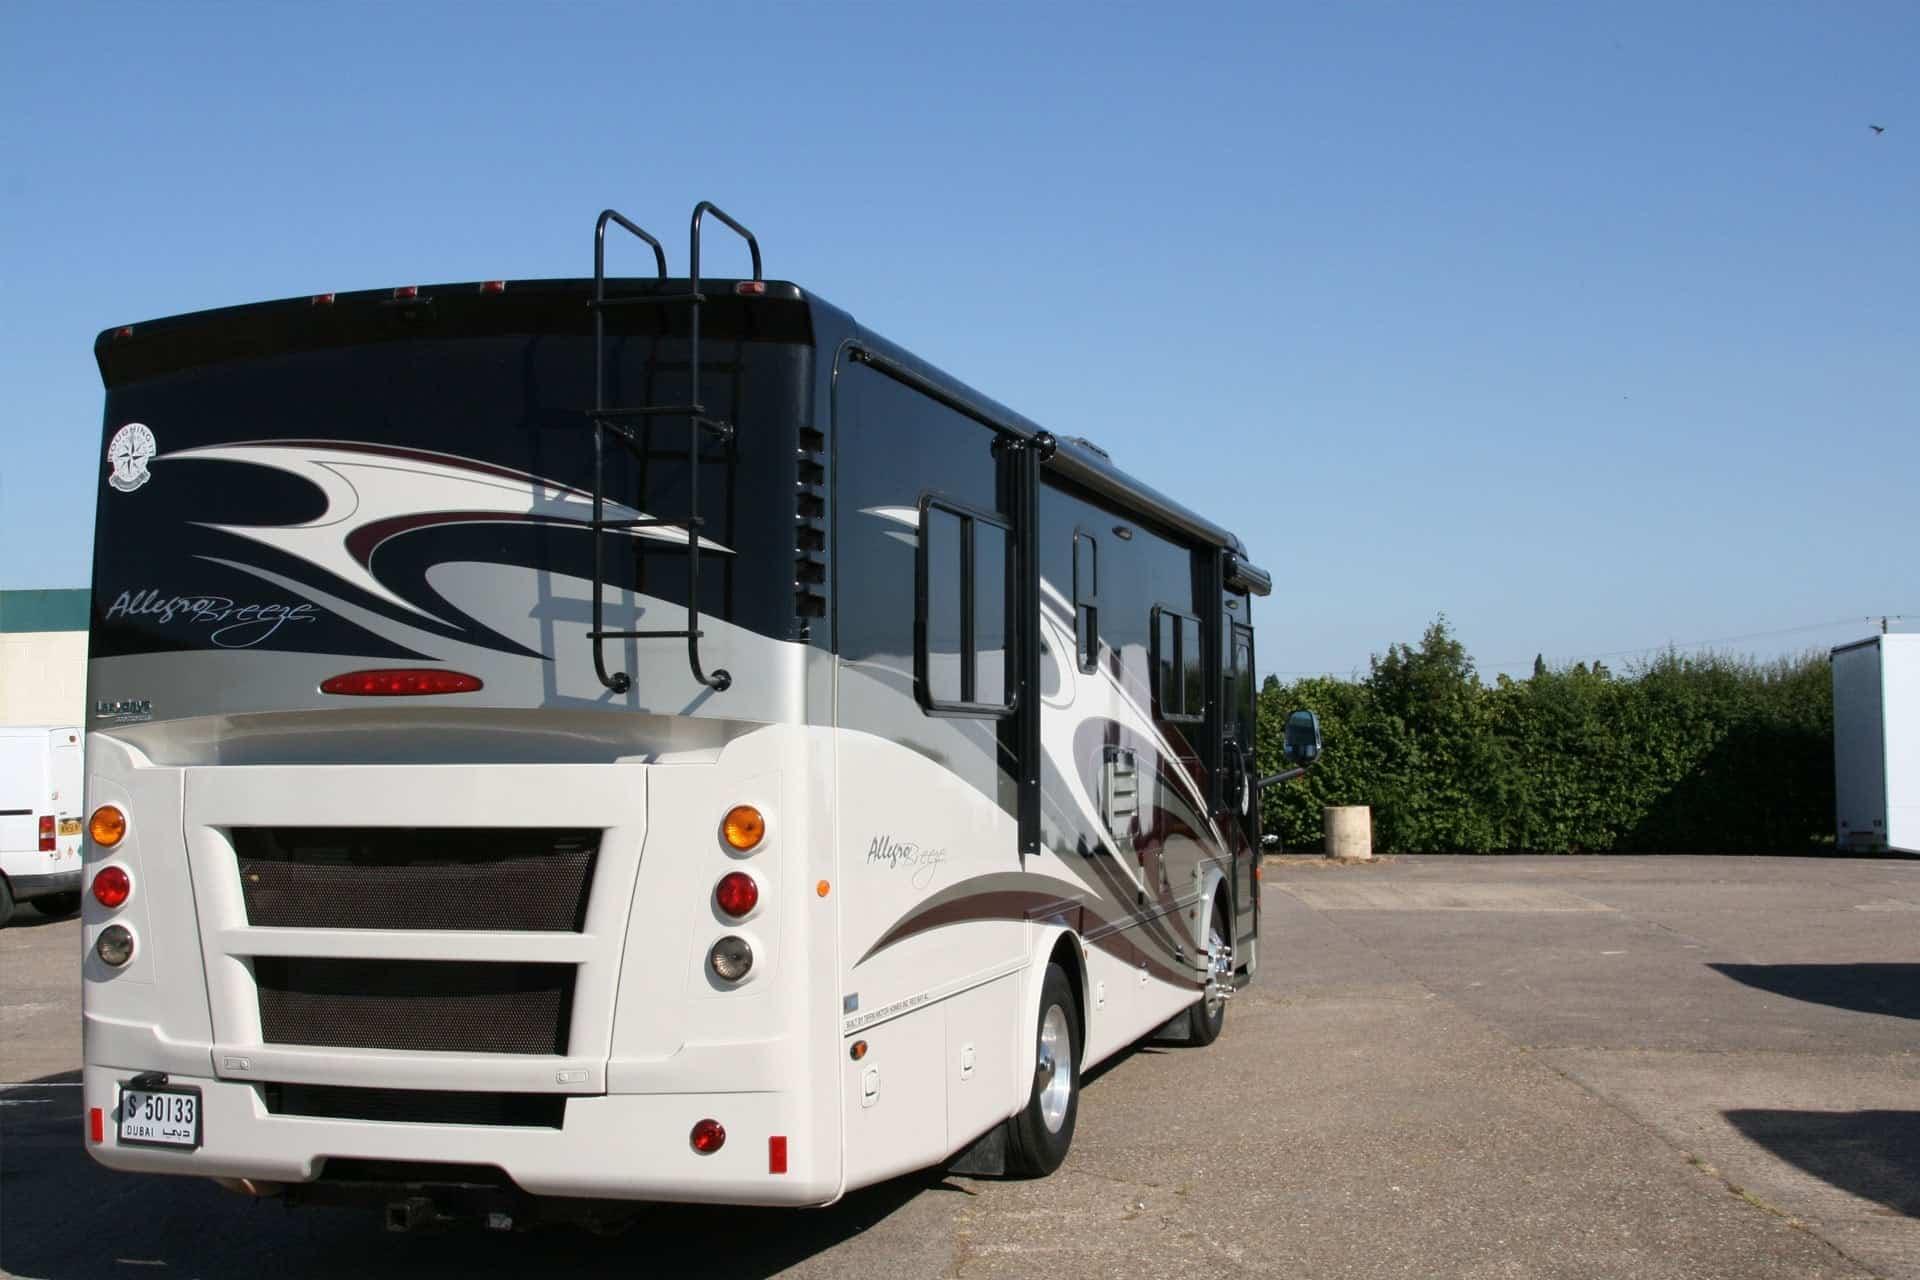 American RV Motorhome IVA Pass gallery item